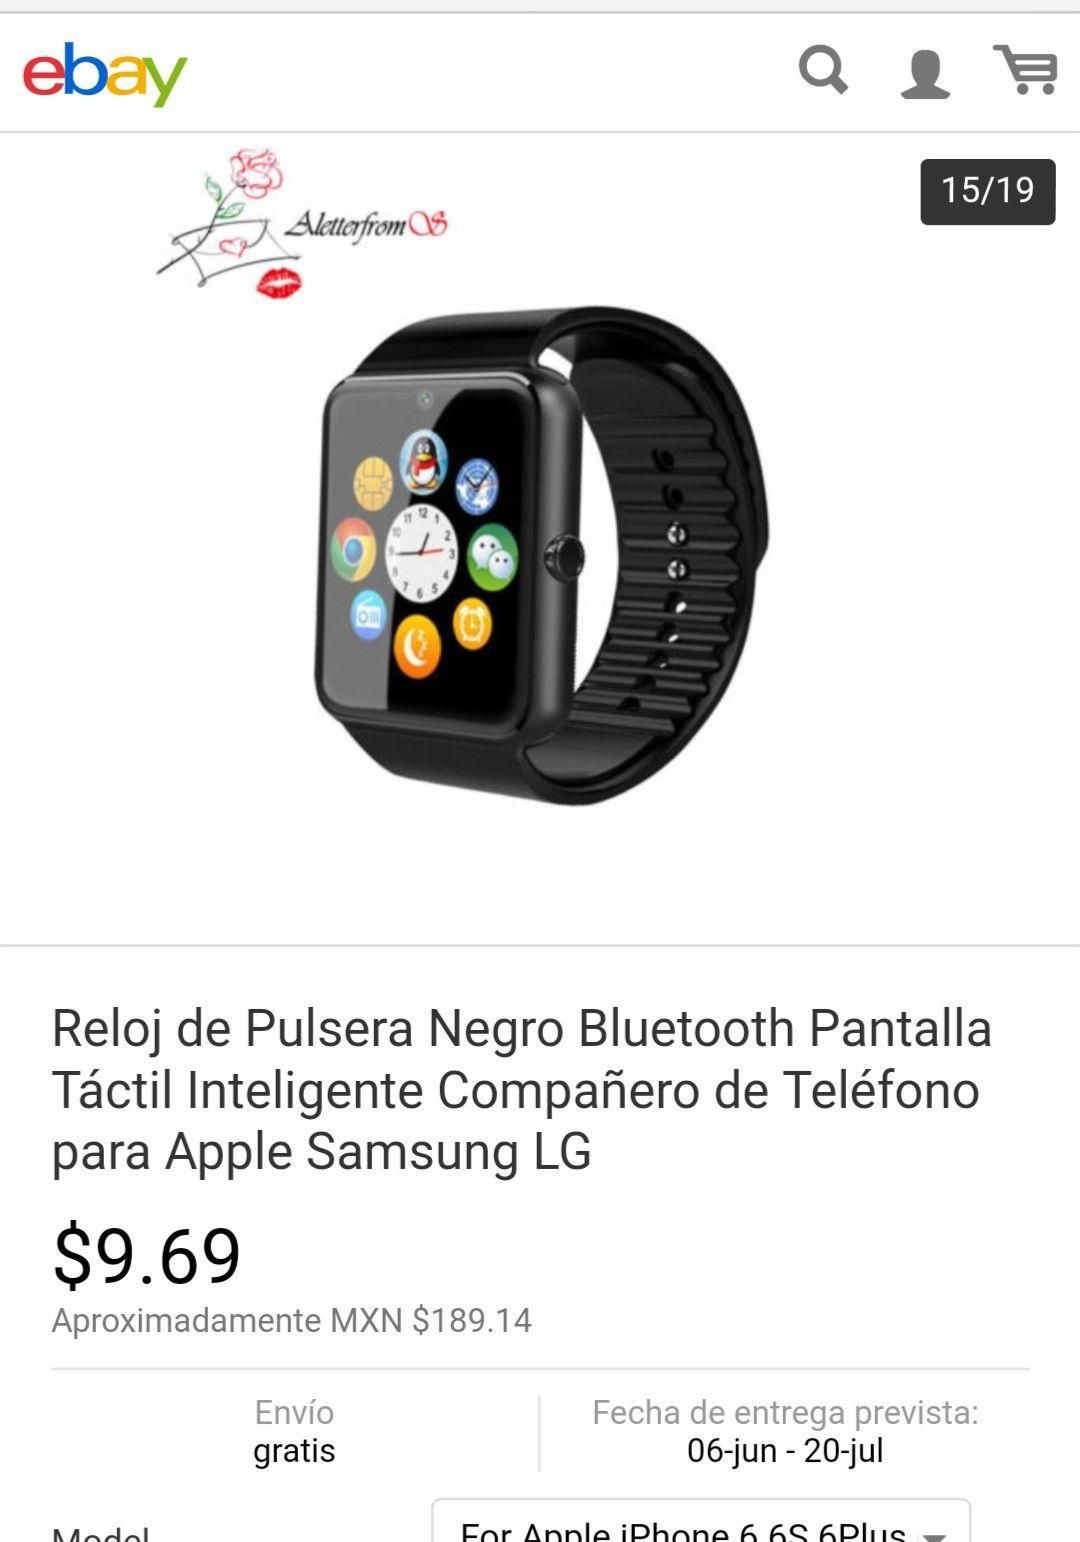 ebay: Smartwatch por 100 pesos o menos (aplica cupón -$5 de eBay)